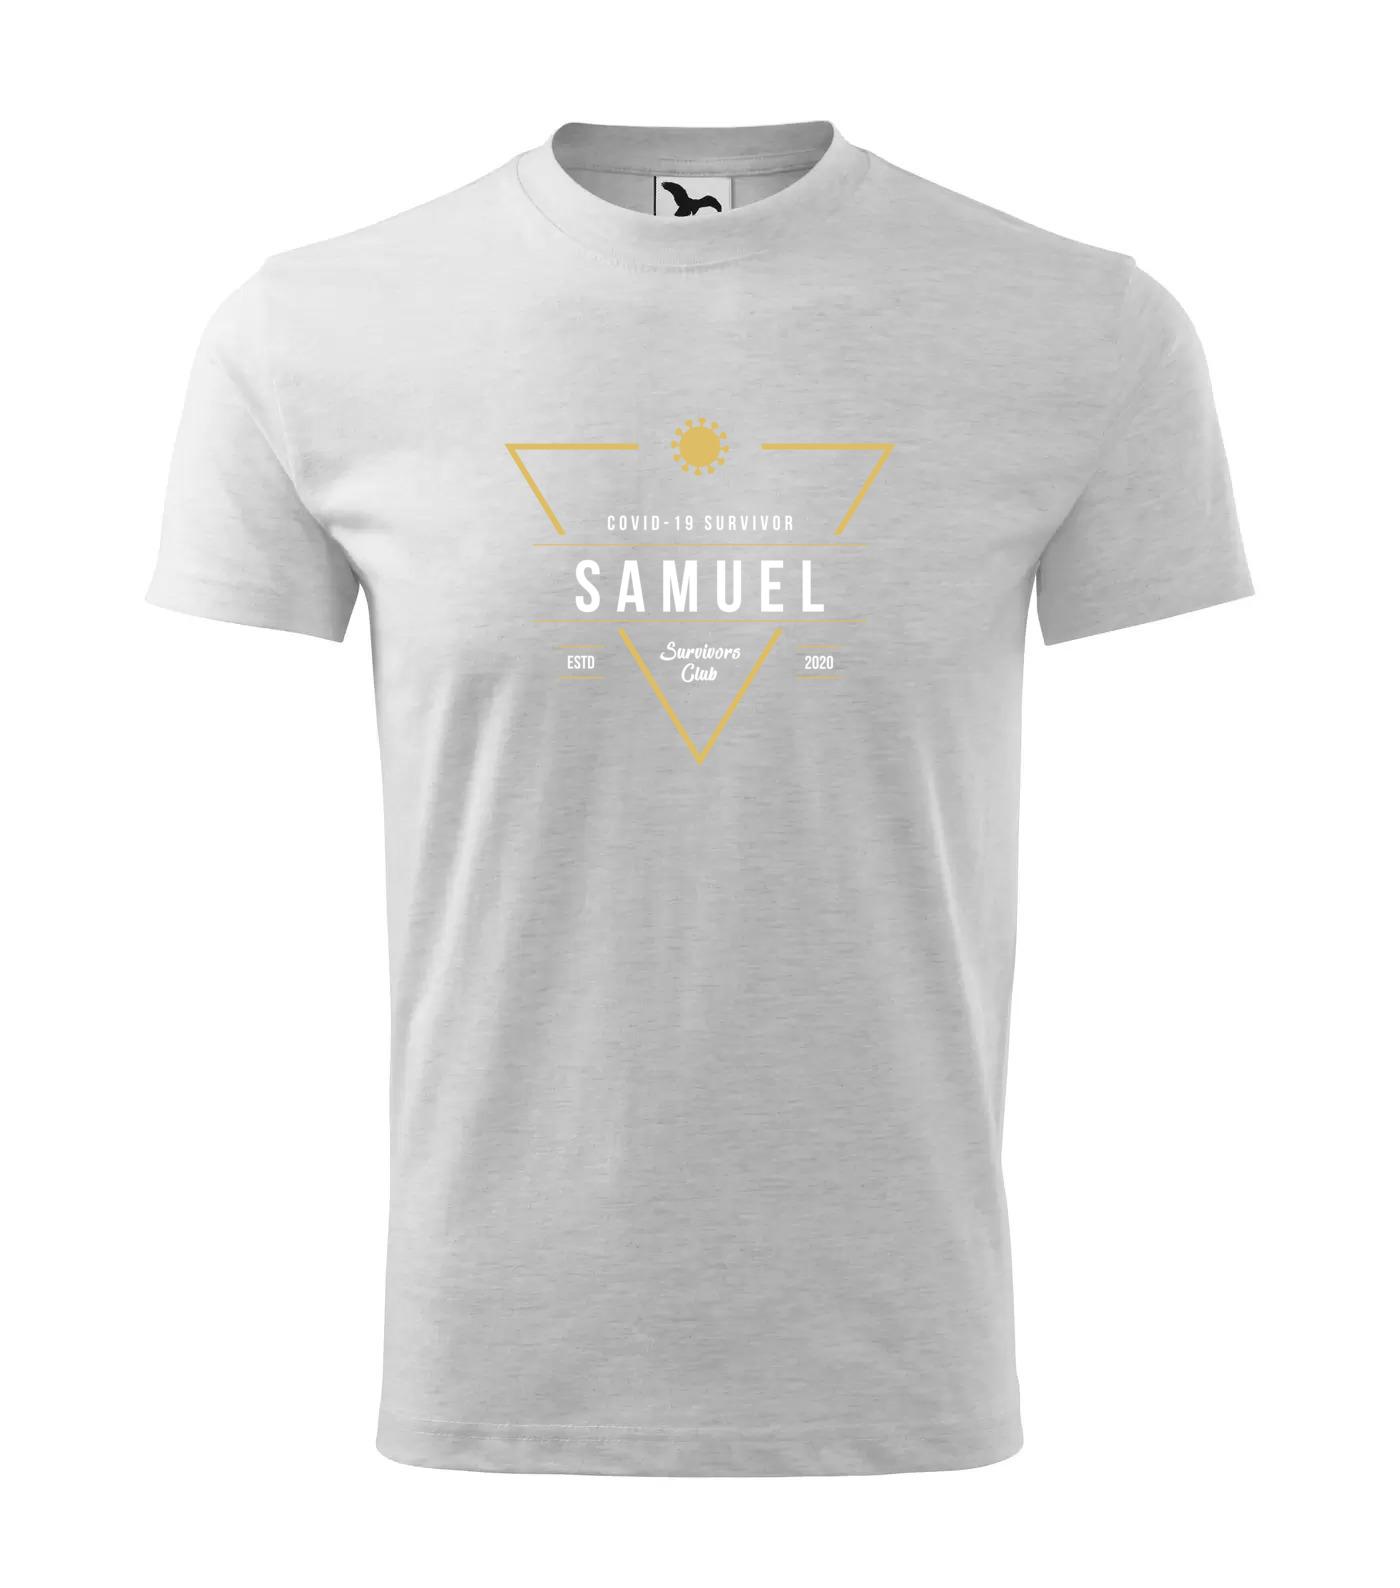 Tričko Survivor Club Samuel